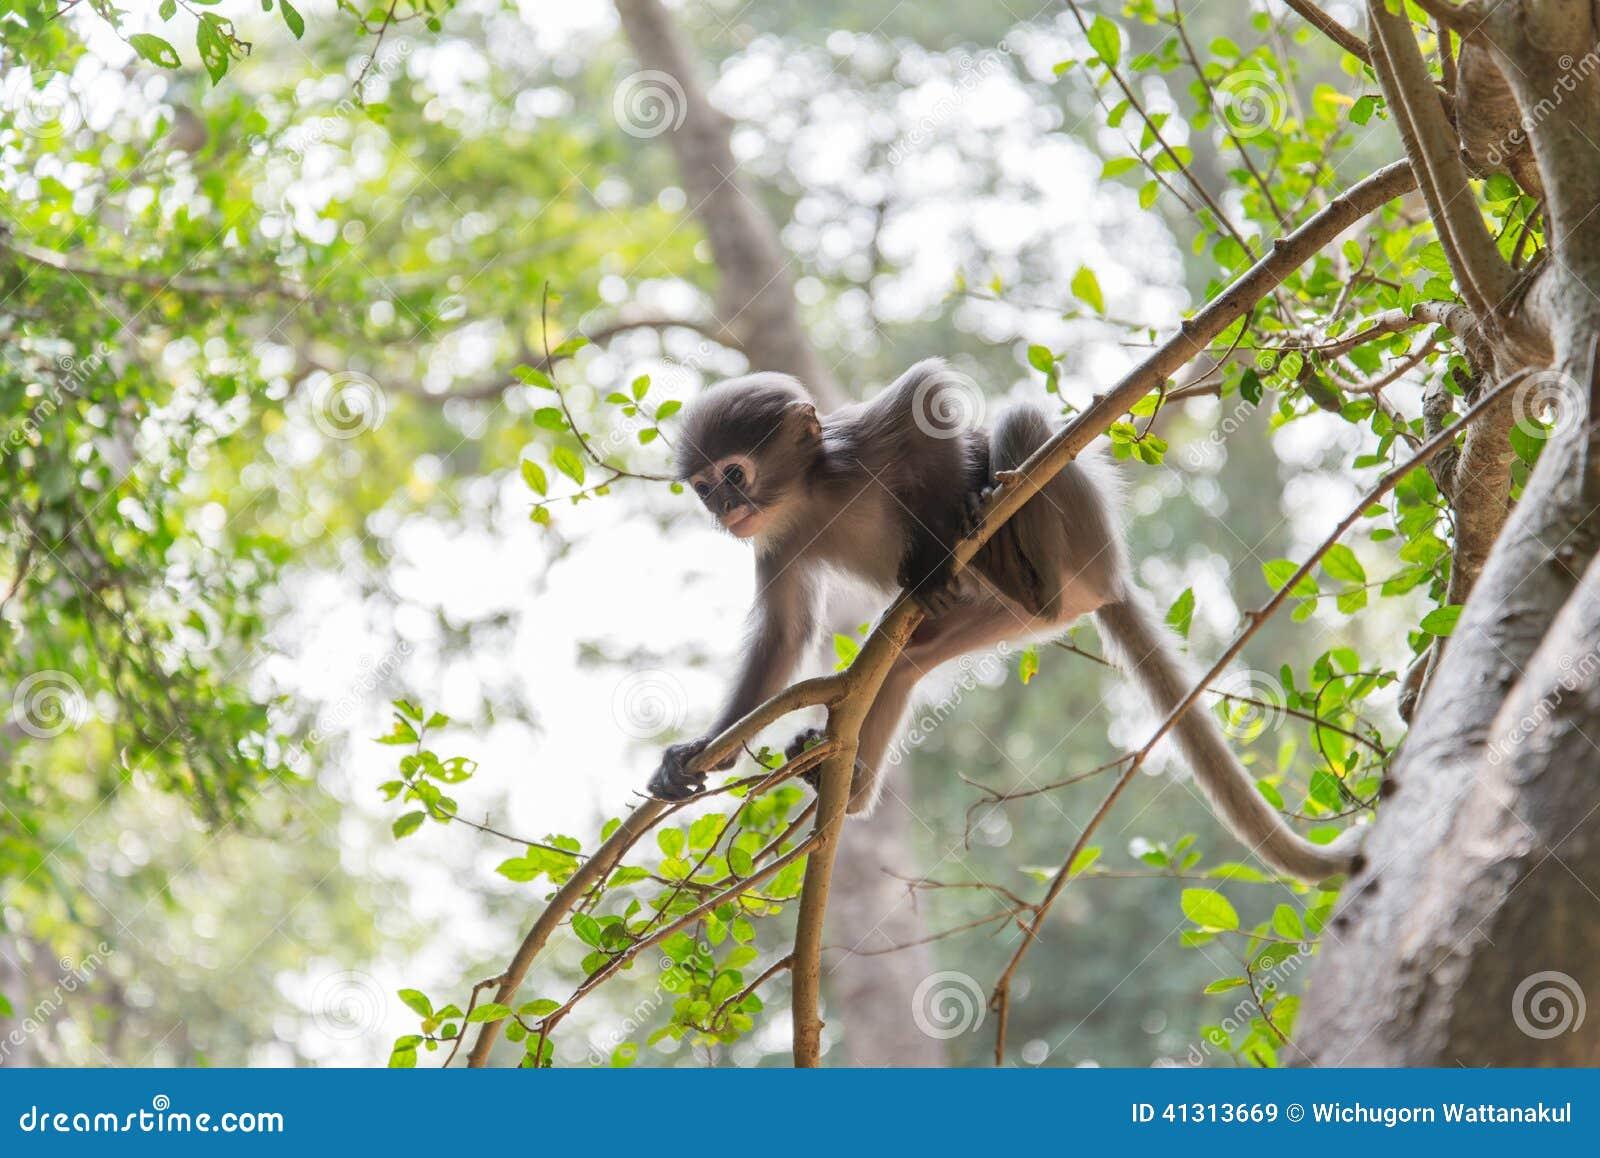 baby monkey is hanging on the tree stock photo image 41313669